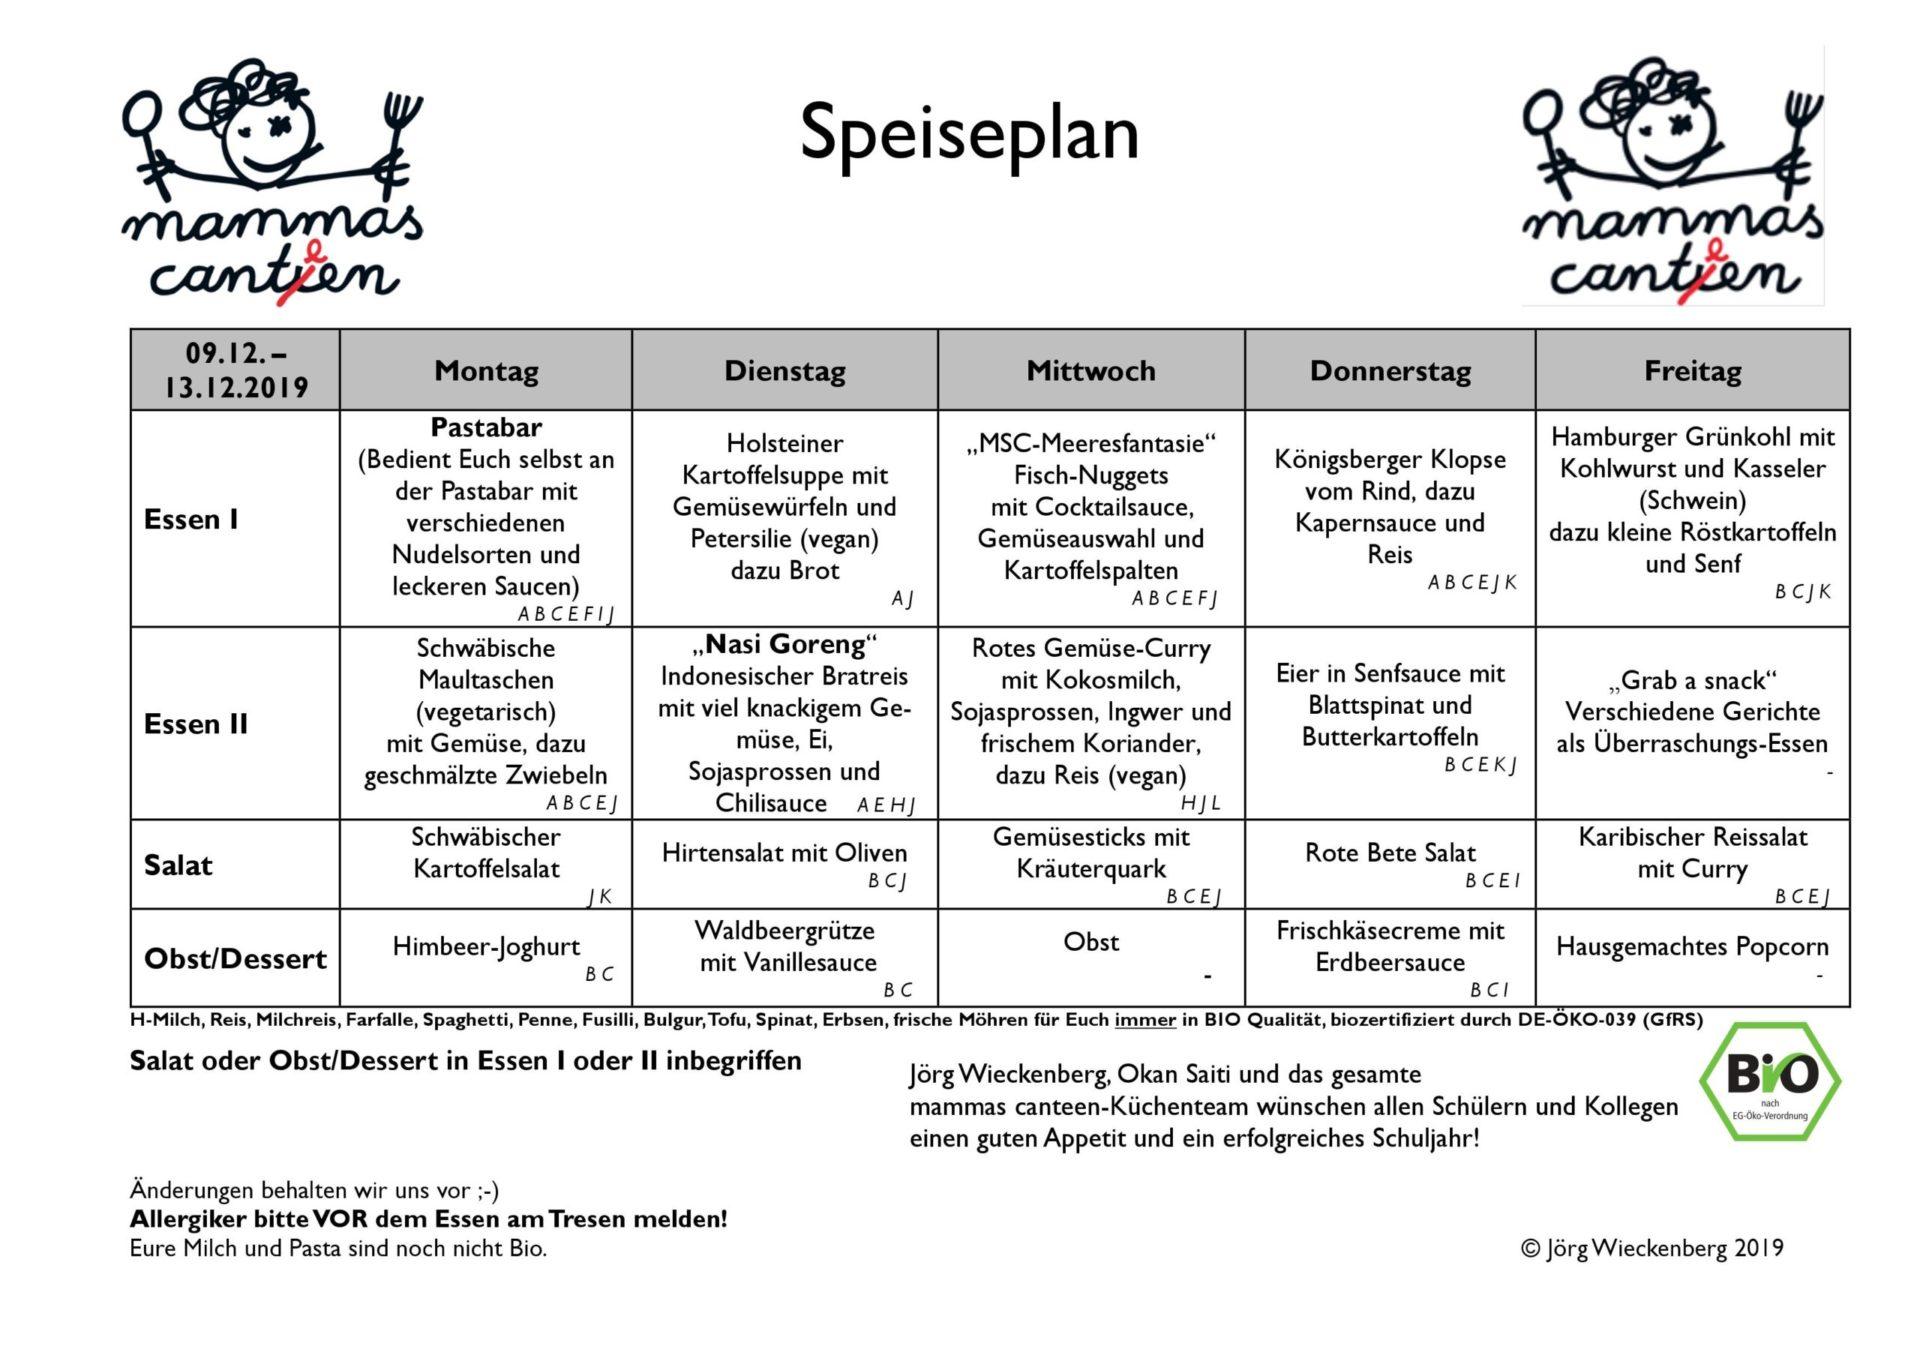 mammas canteen Speiseplan 09.12. -13.12.2019